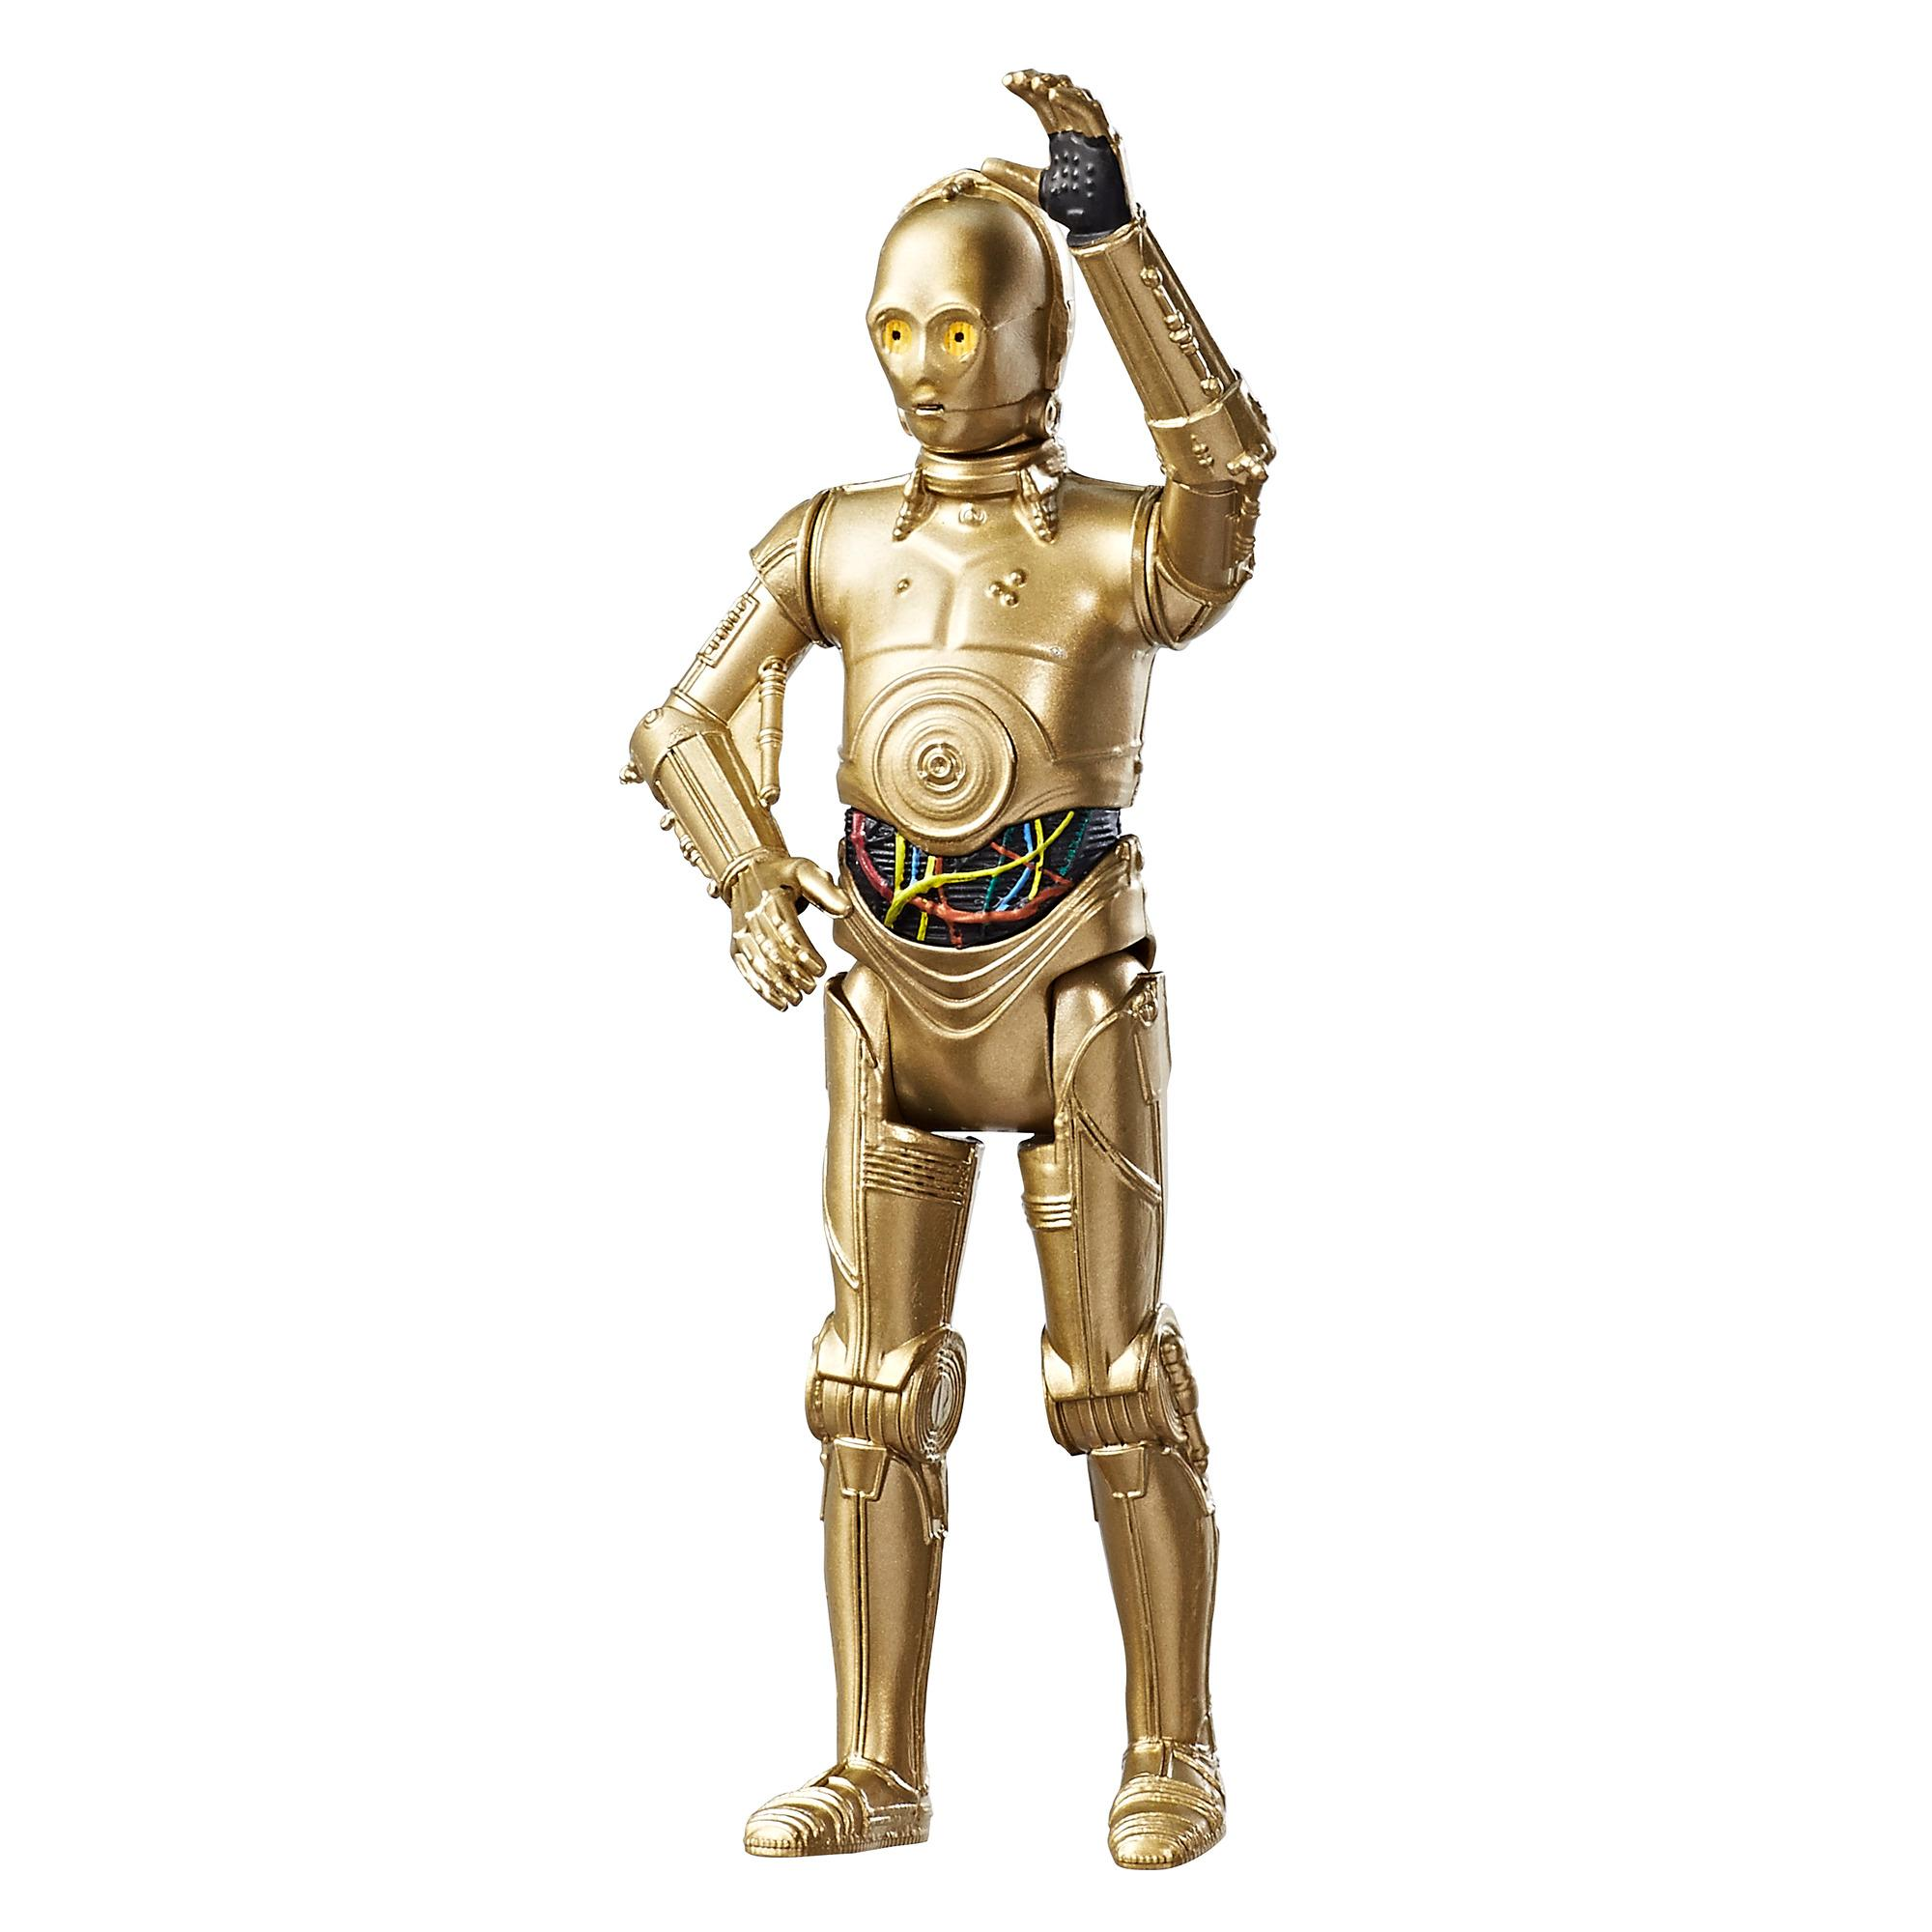 Star Wars C-3PO Force Link Figure